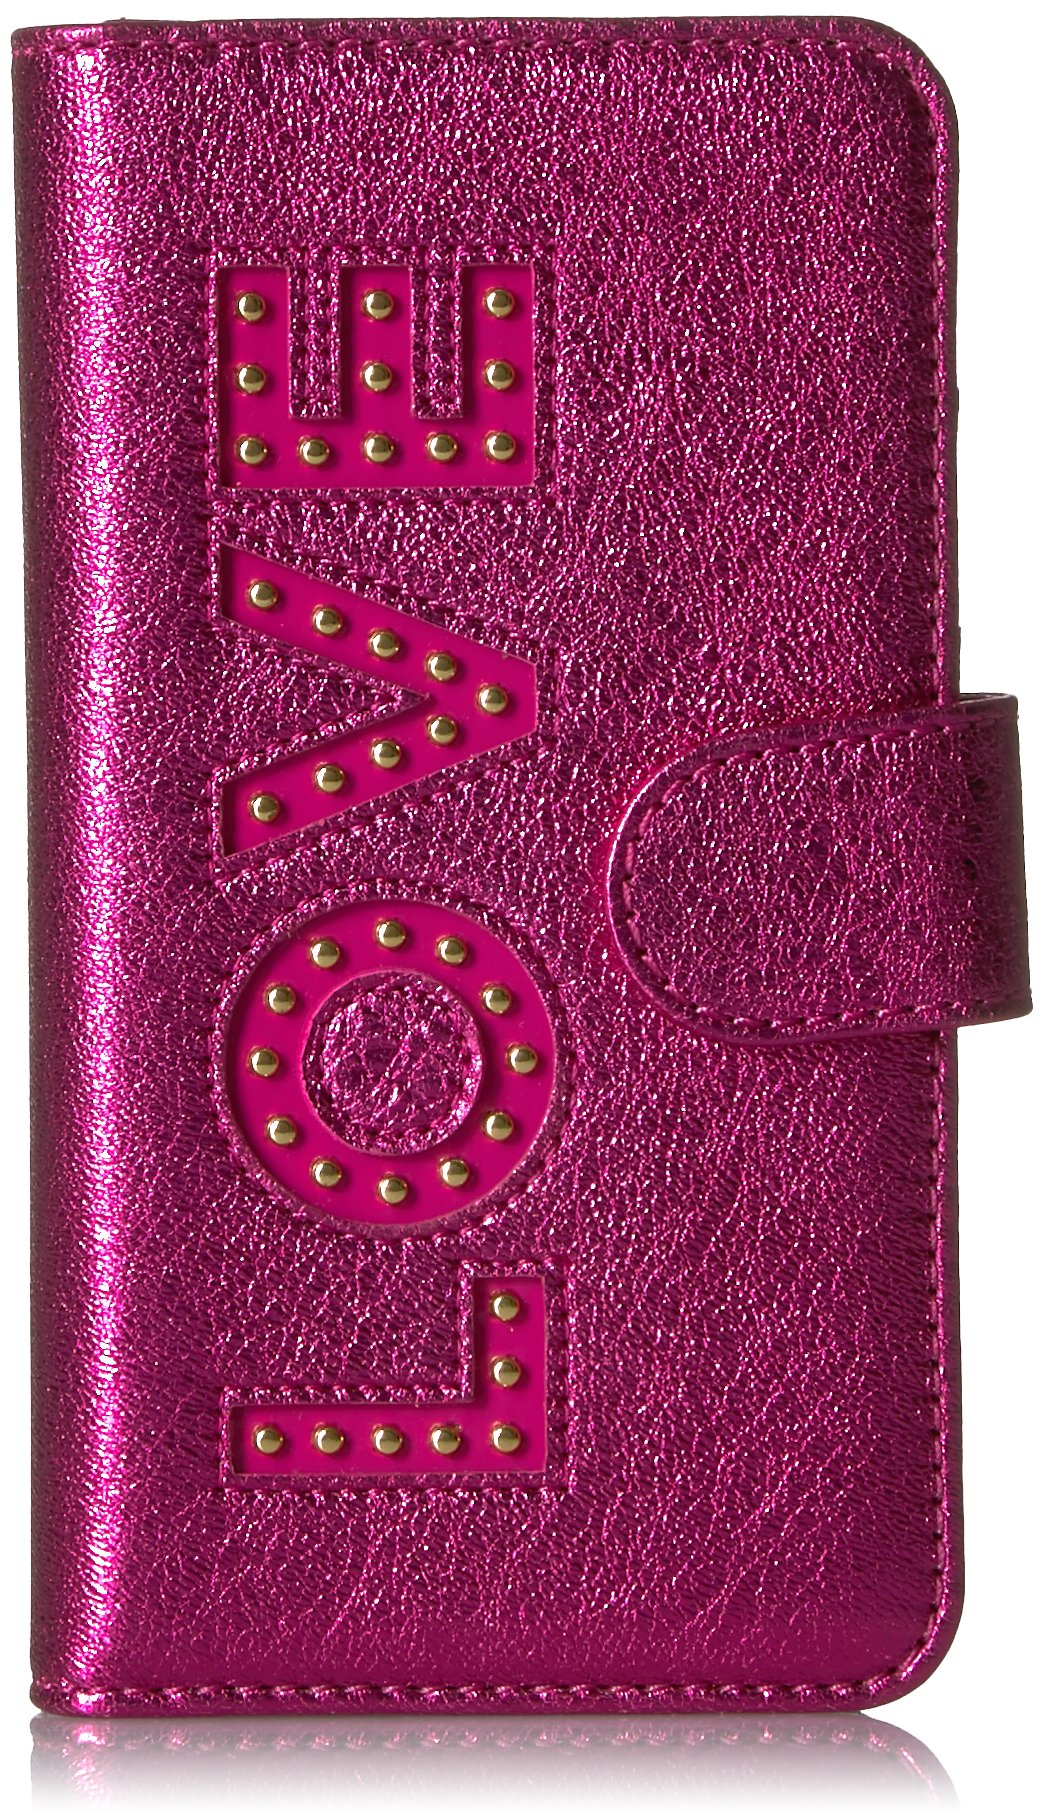 Michael Kors Love Folio Phn Cse Tab 7, Ultra Pink